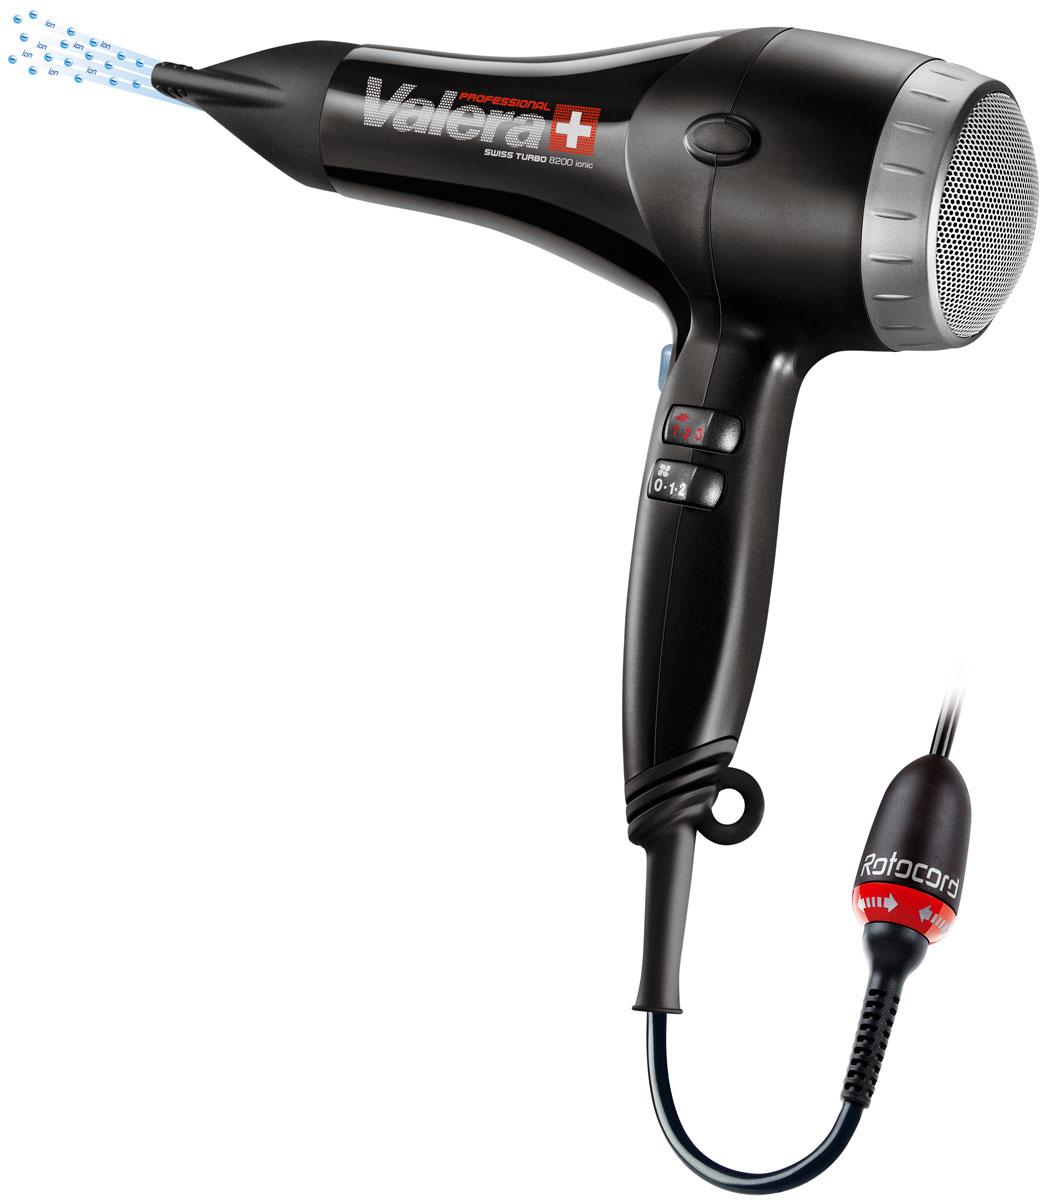 Valera ST 8200T RC Swiss Turbo Ionic, Black профессиональный фен